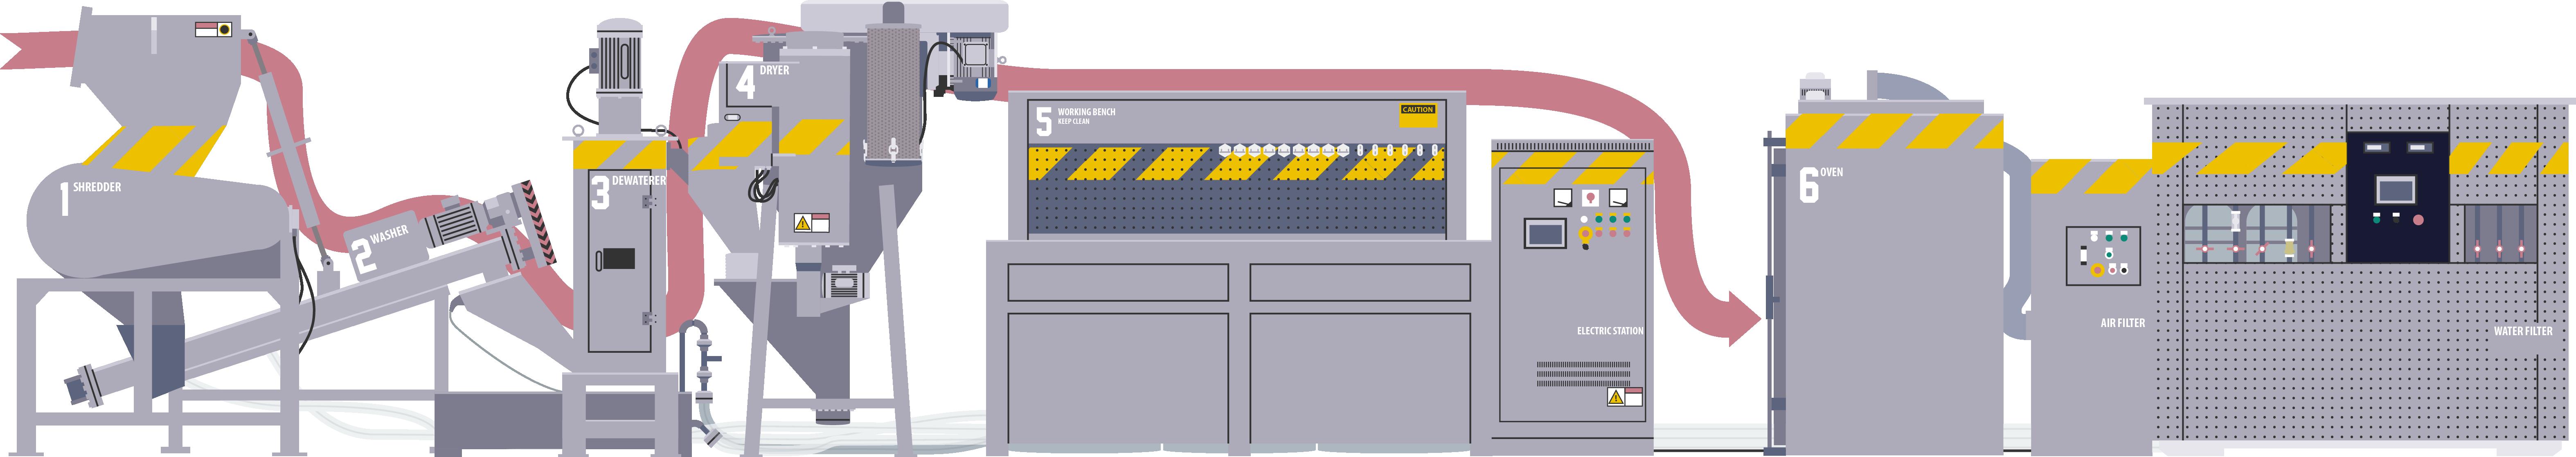 Trashpresso-Website-Tech-MachineDiagram-CS6